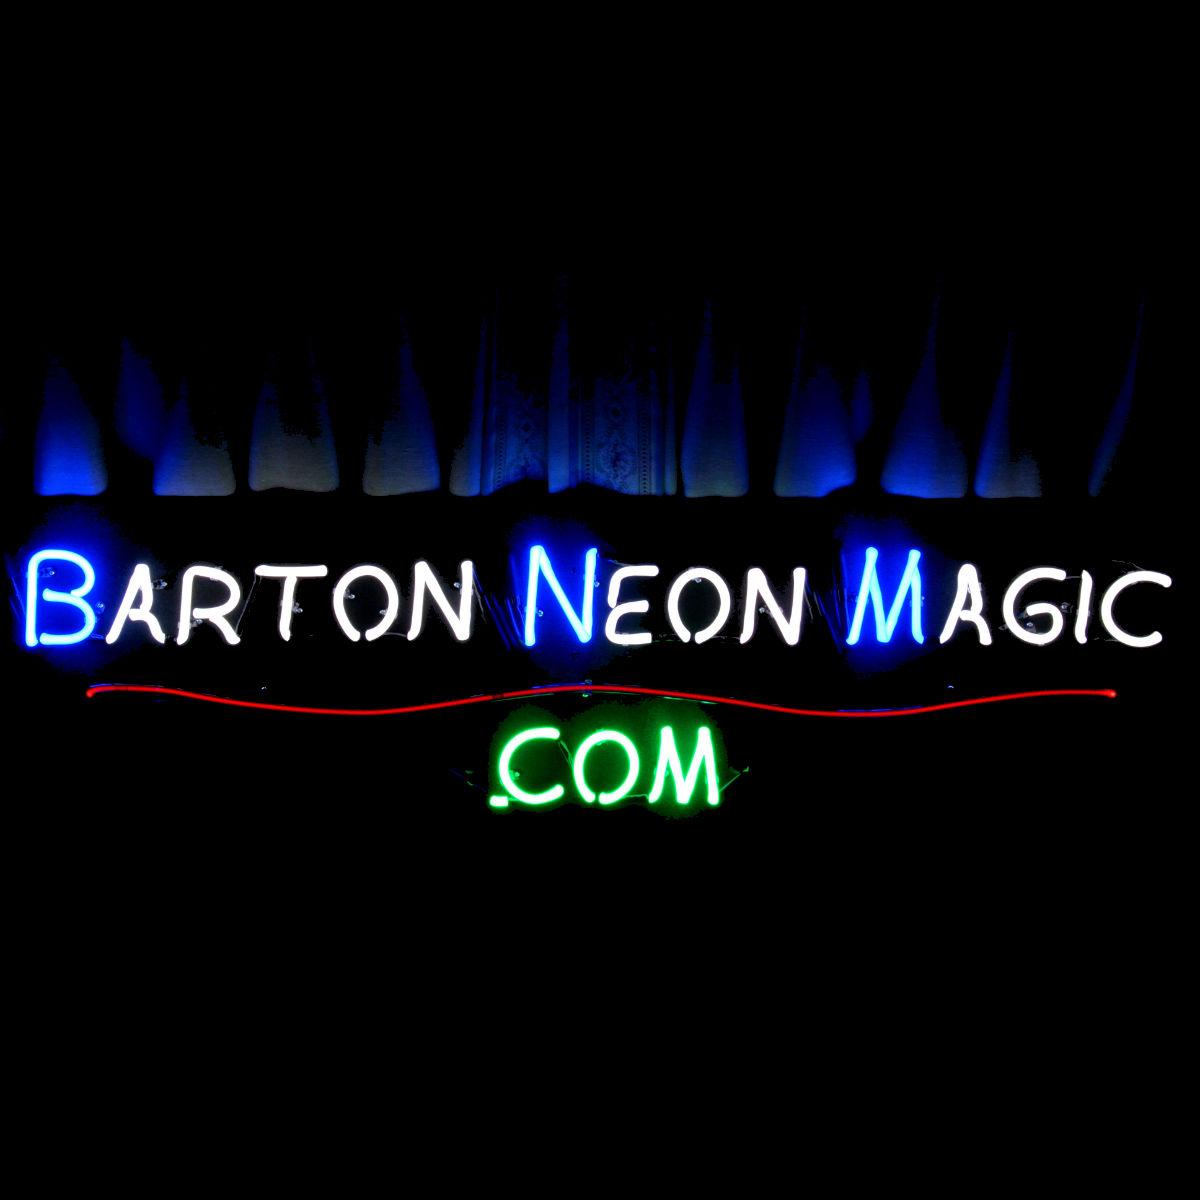 Expert Neon Repair by John Barton - BartonNeonMagic.com